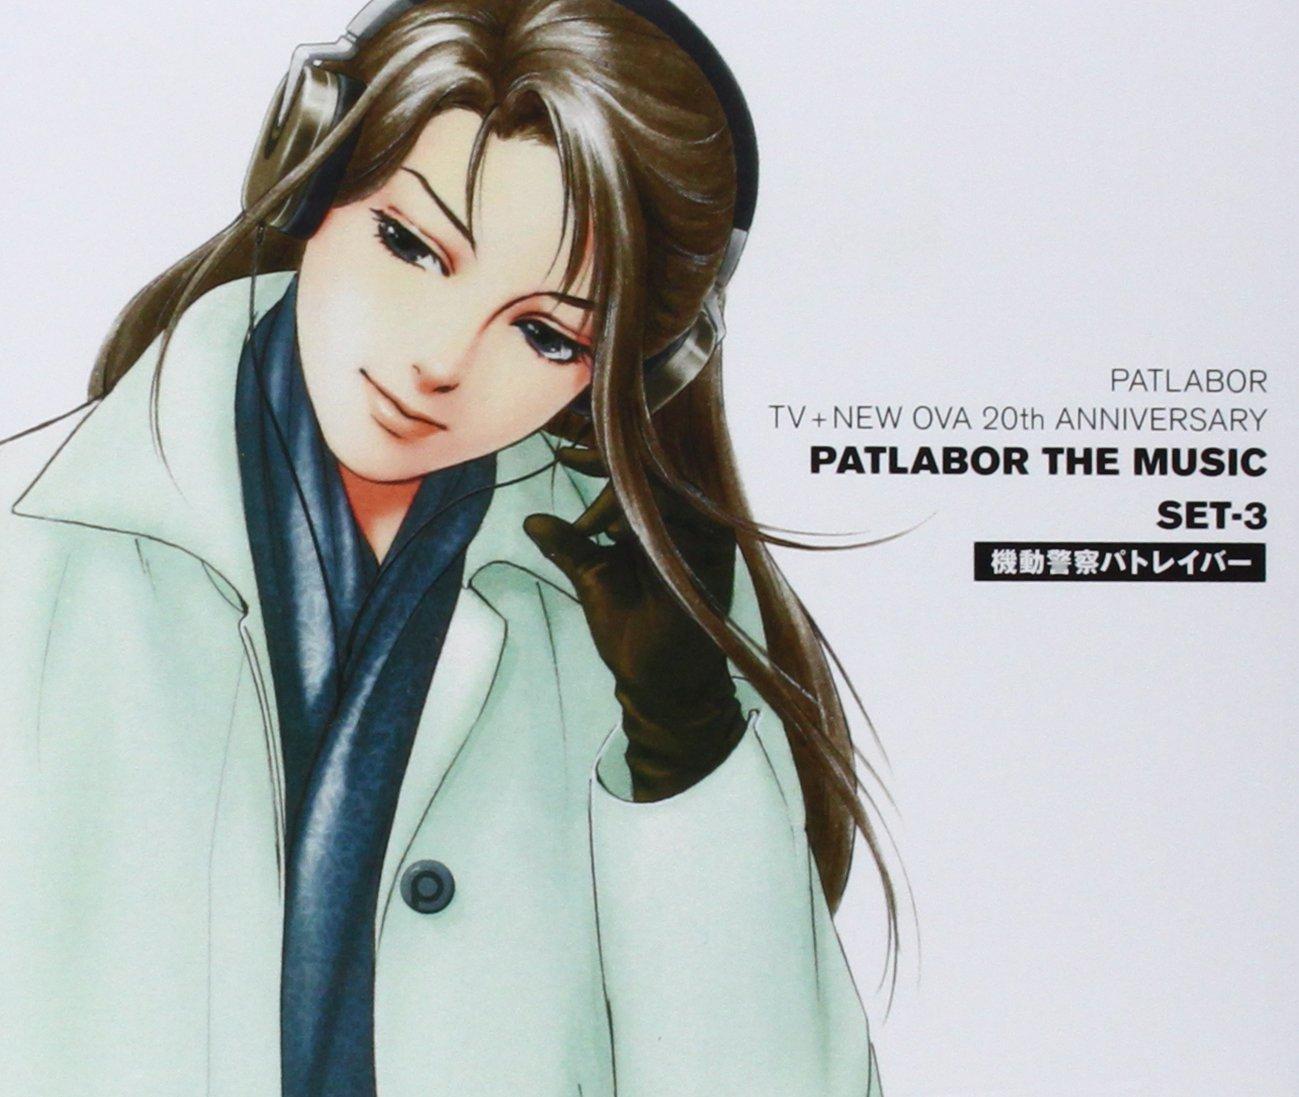 川井憲次 (Kenji Kawai) – PATLABOR TV+NEW OVA 20th ANNIVERSARY PATLABOR THE MUSIC SET-3 [FLAC / Blu-spec CD] [2010.10.27]